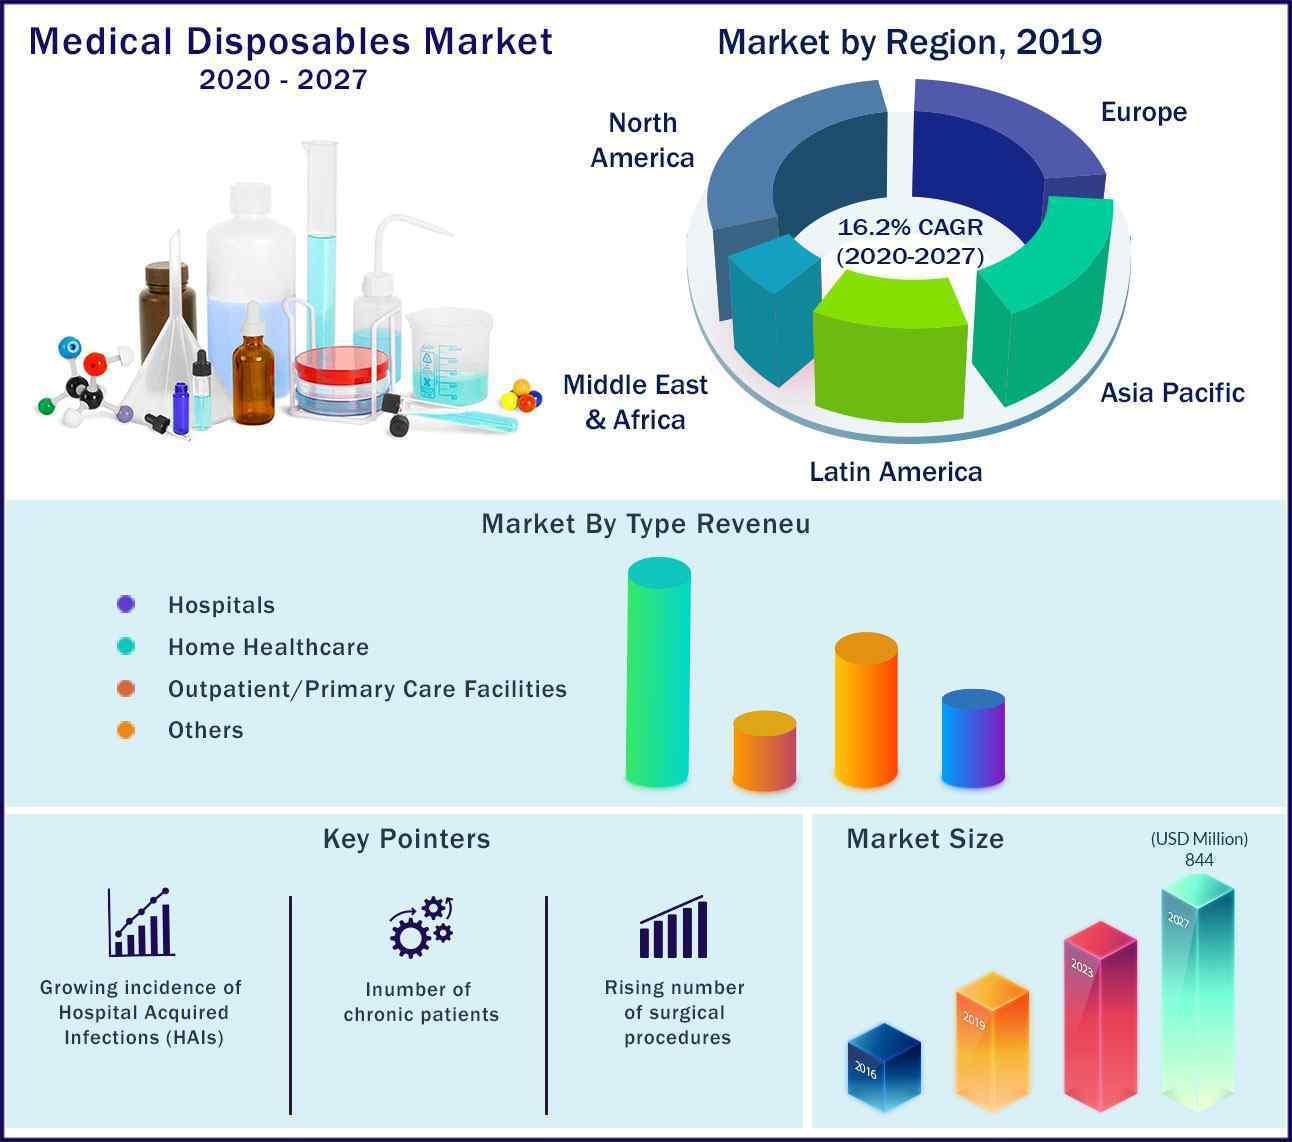 Global Medical Disposables Market 2020 to 2027